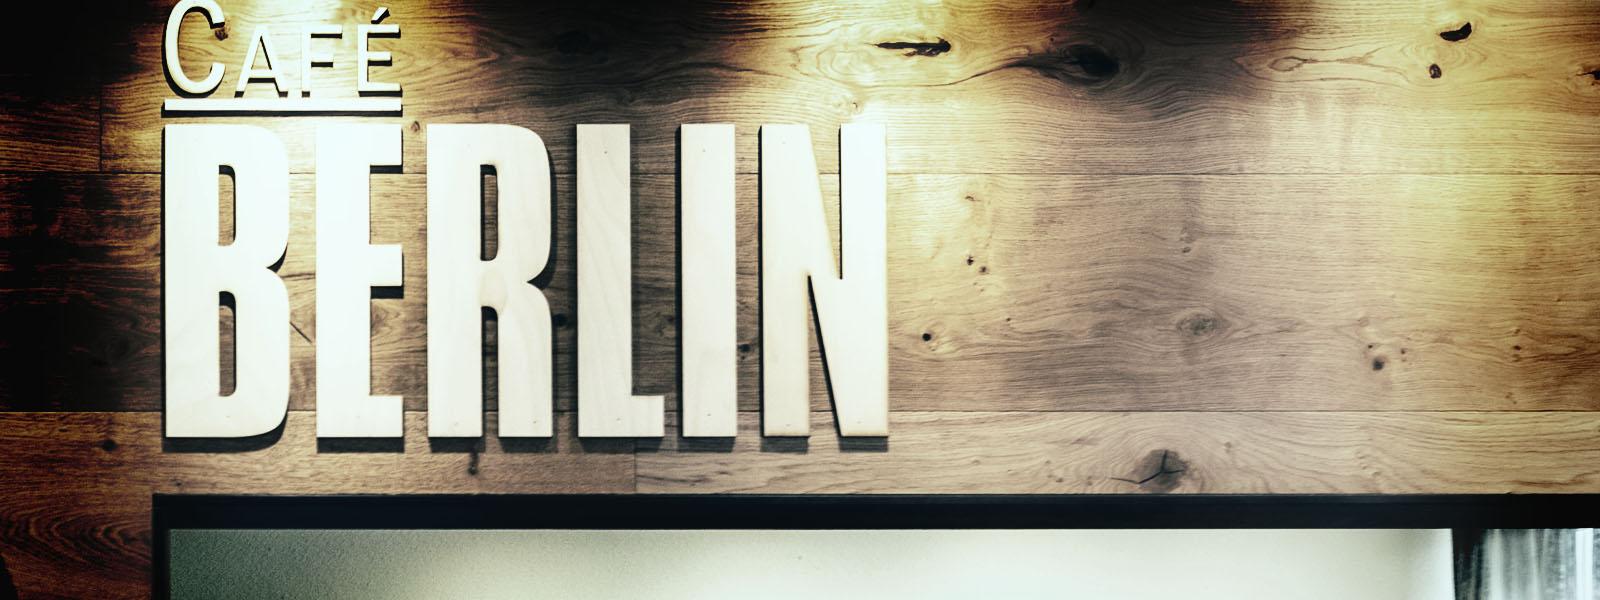 Berliner Luft im Taunus